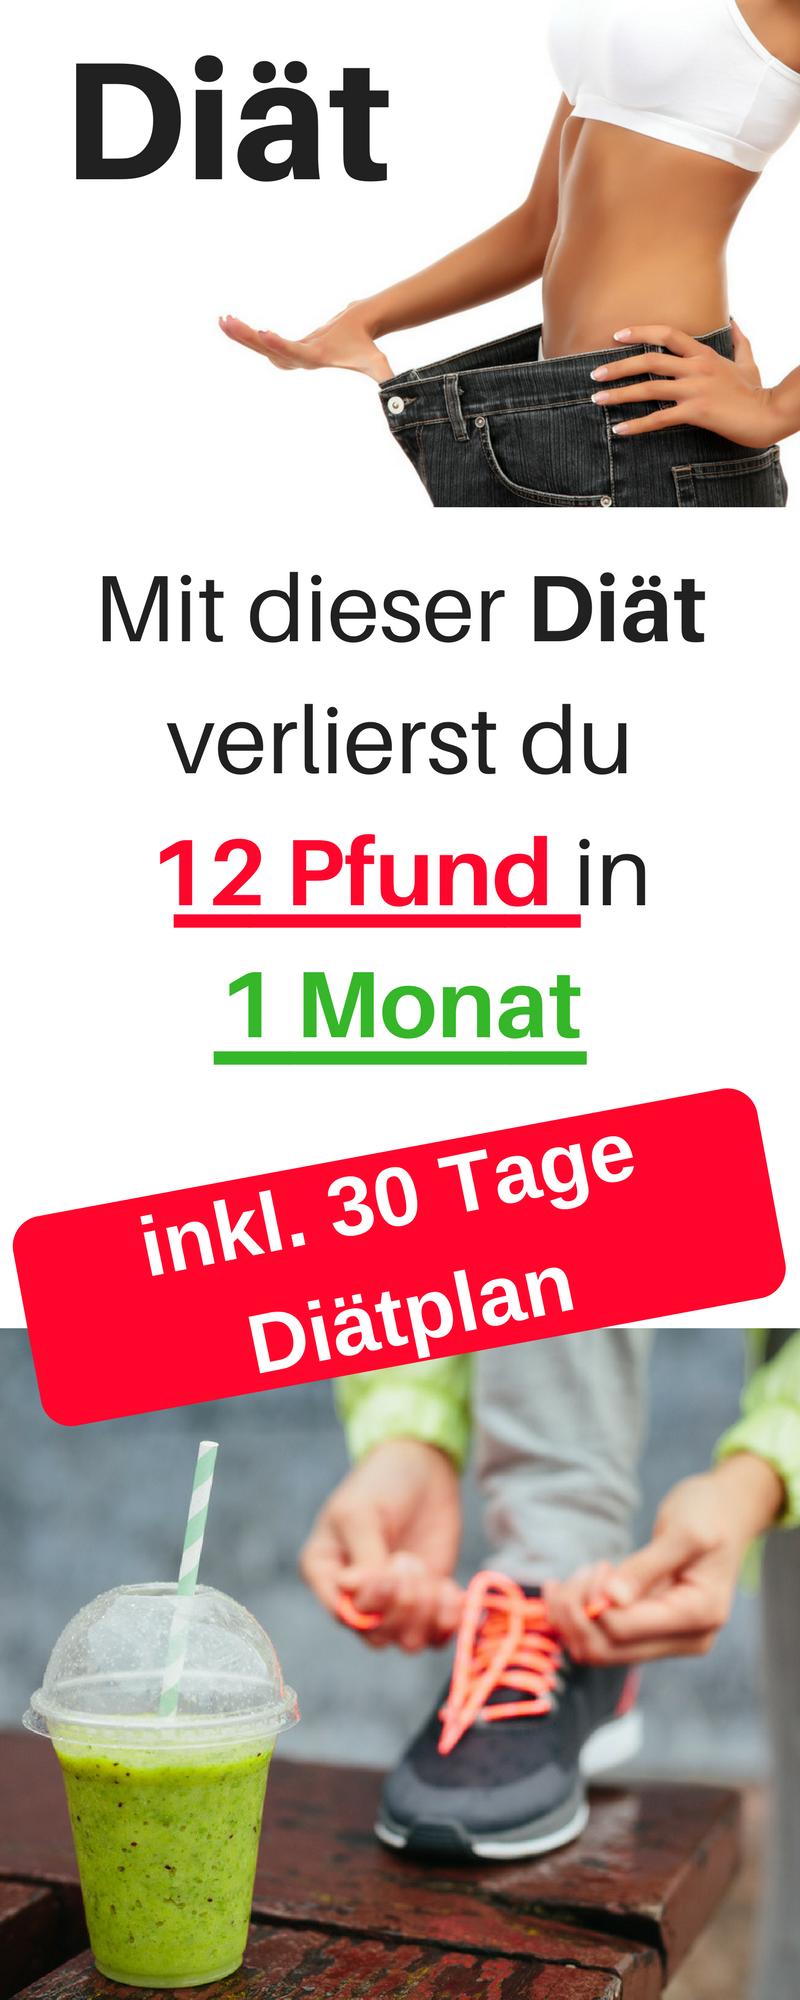 Abnehmplan Erstellen Abnehmplan 1 Woche Abnehmplan Deutsch